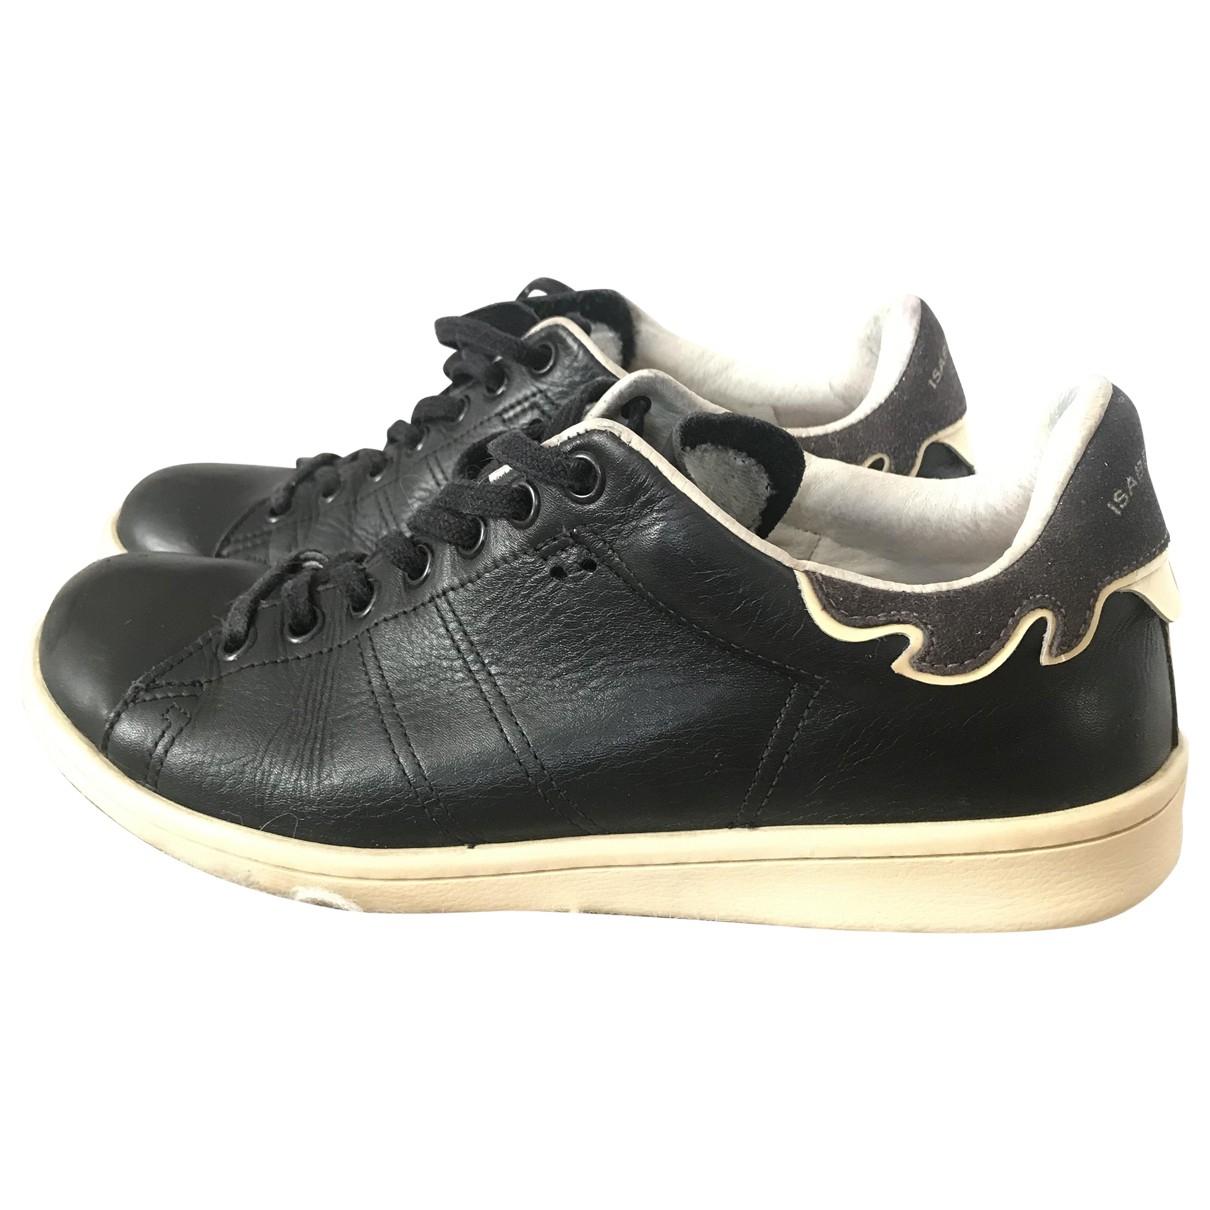 Isabel Marant Bart Black Leather Trainers for Women 37 EU